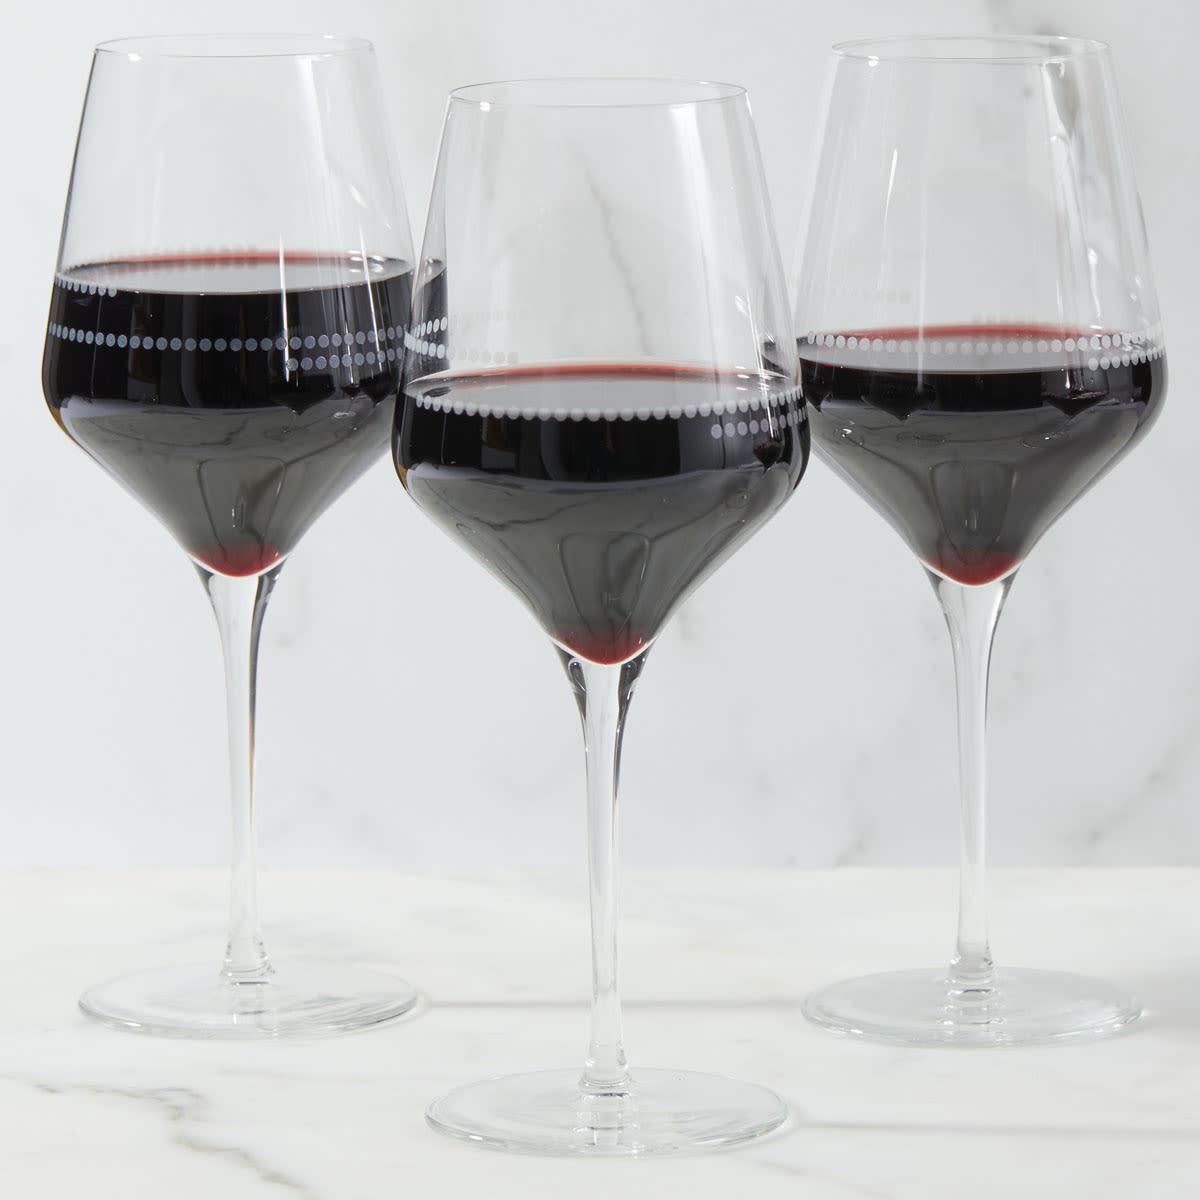 wine glass portions